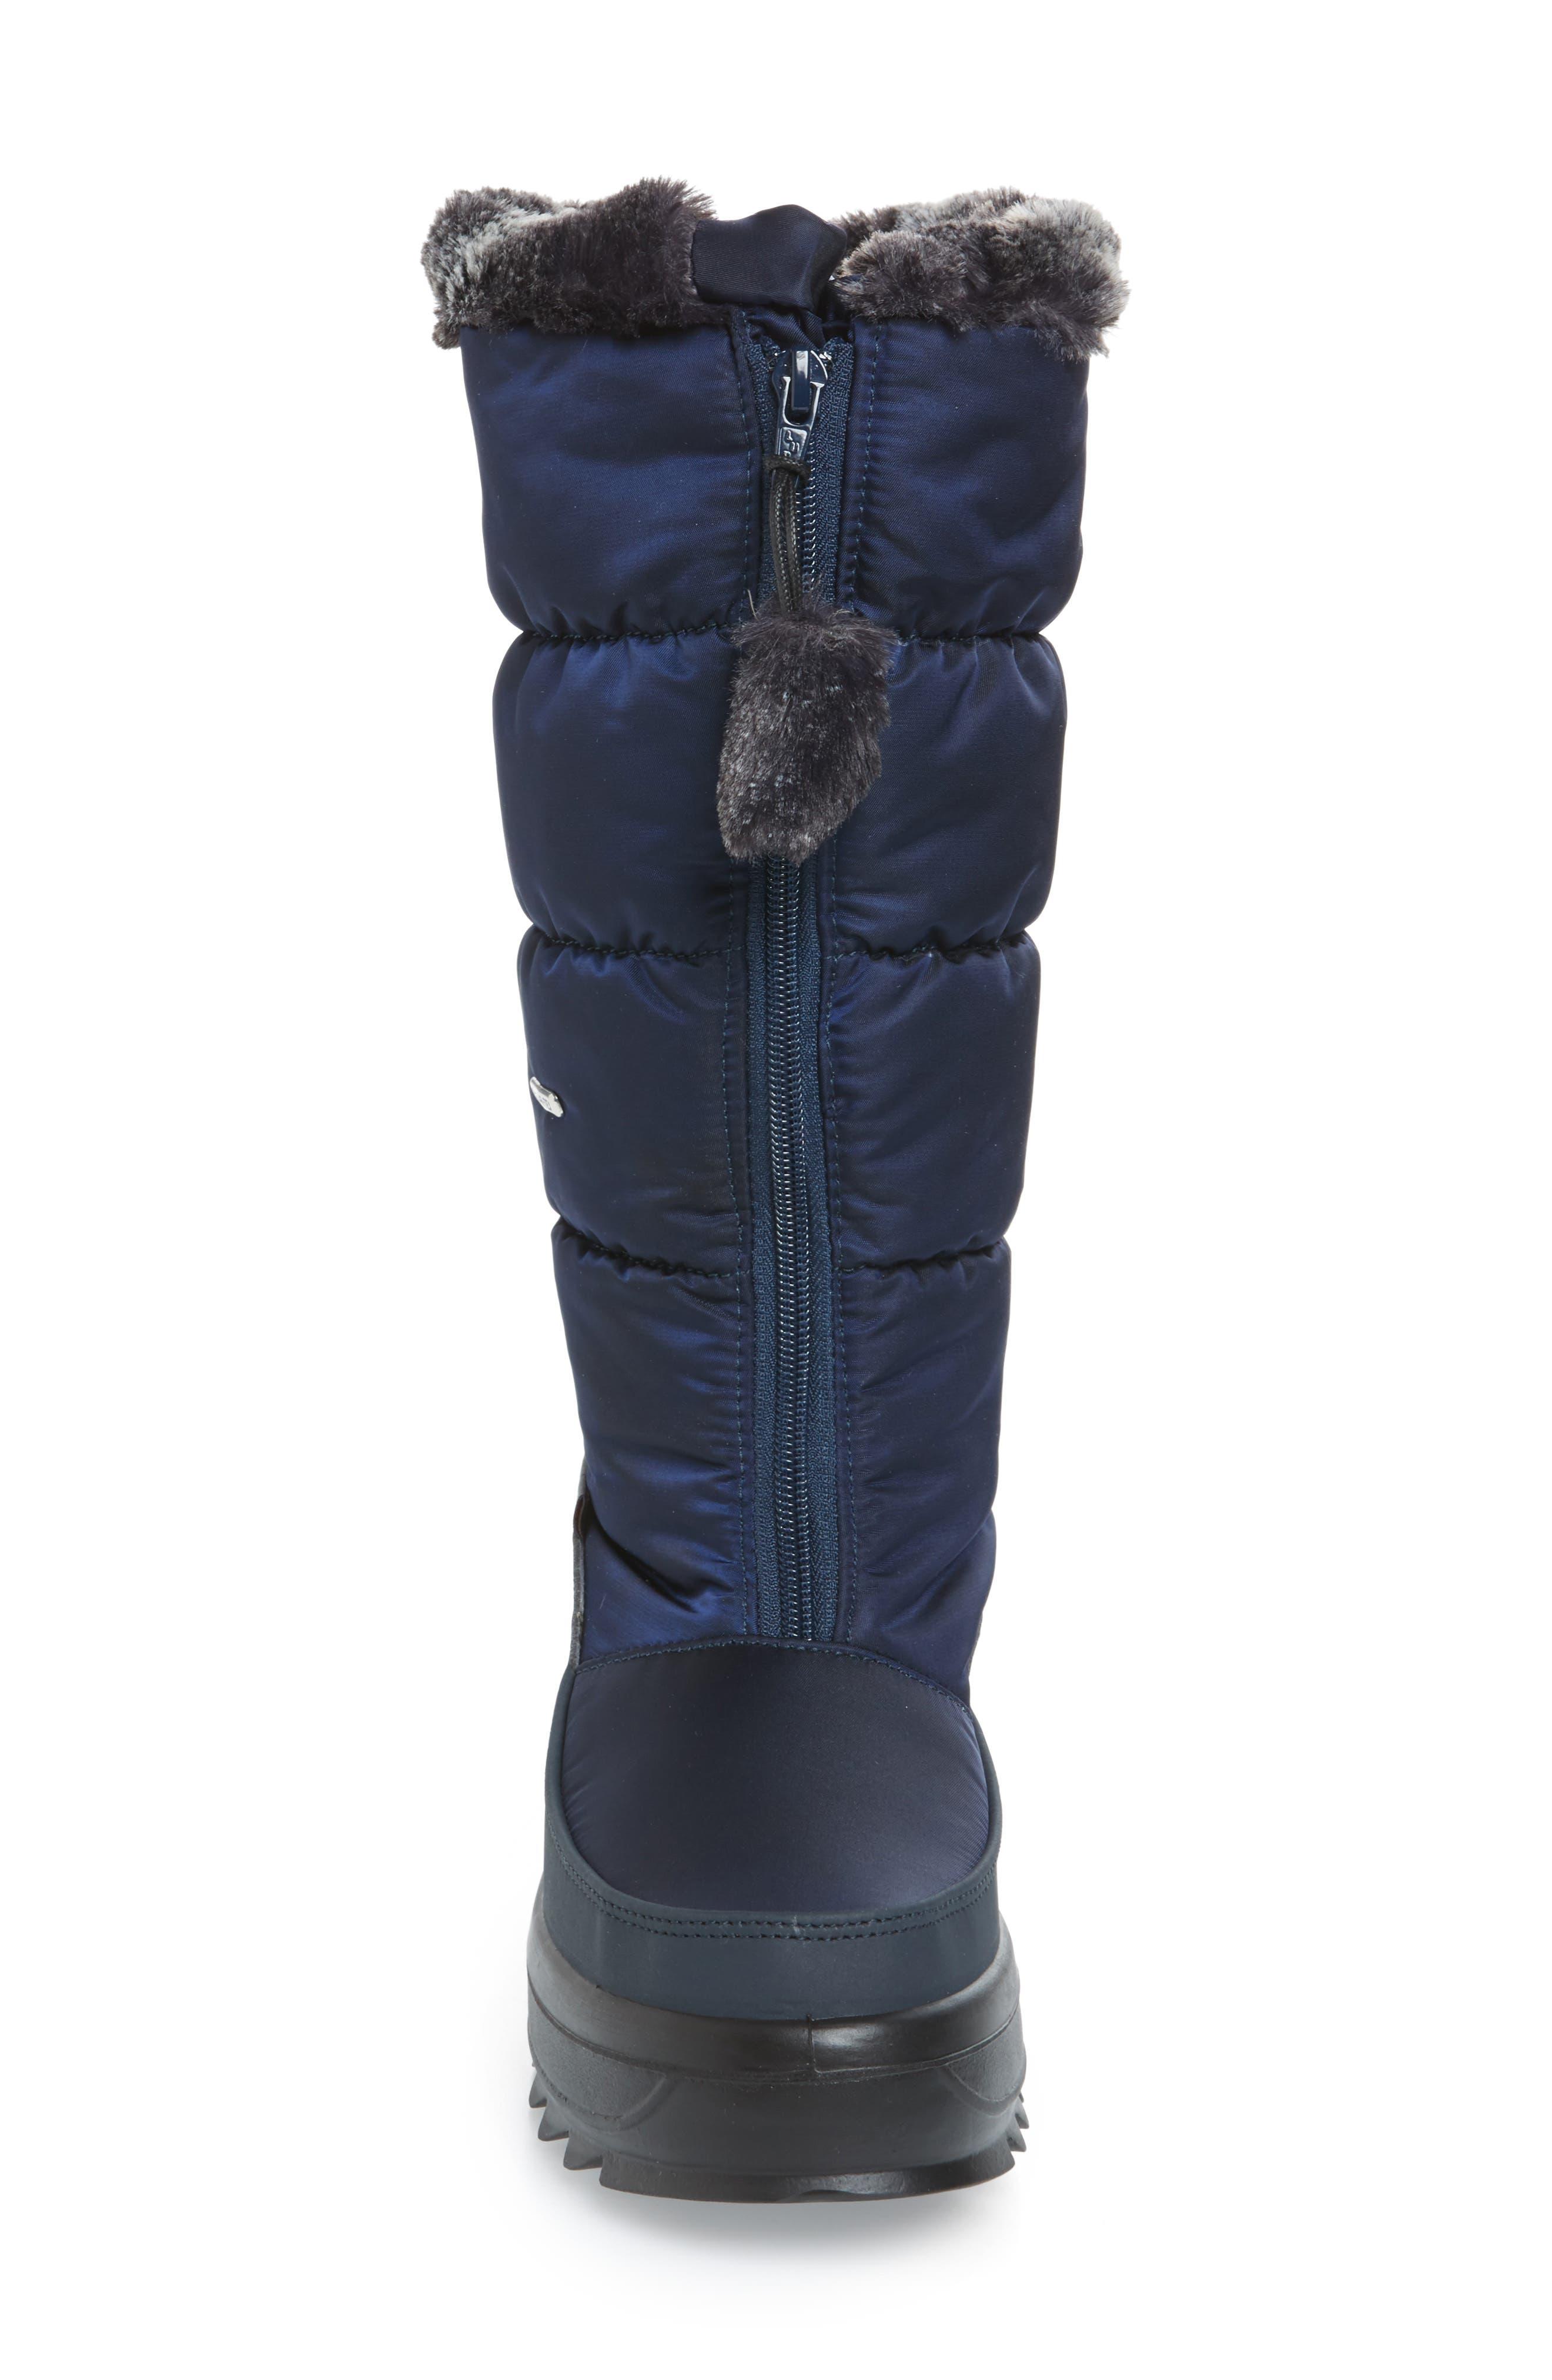 Toboggan 2 Faux Fur Trim Insulated Waterproof Boot,                             Alternate thumbnail 4, color,                             NAVY FABRIC